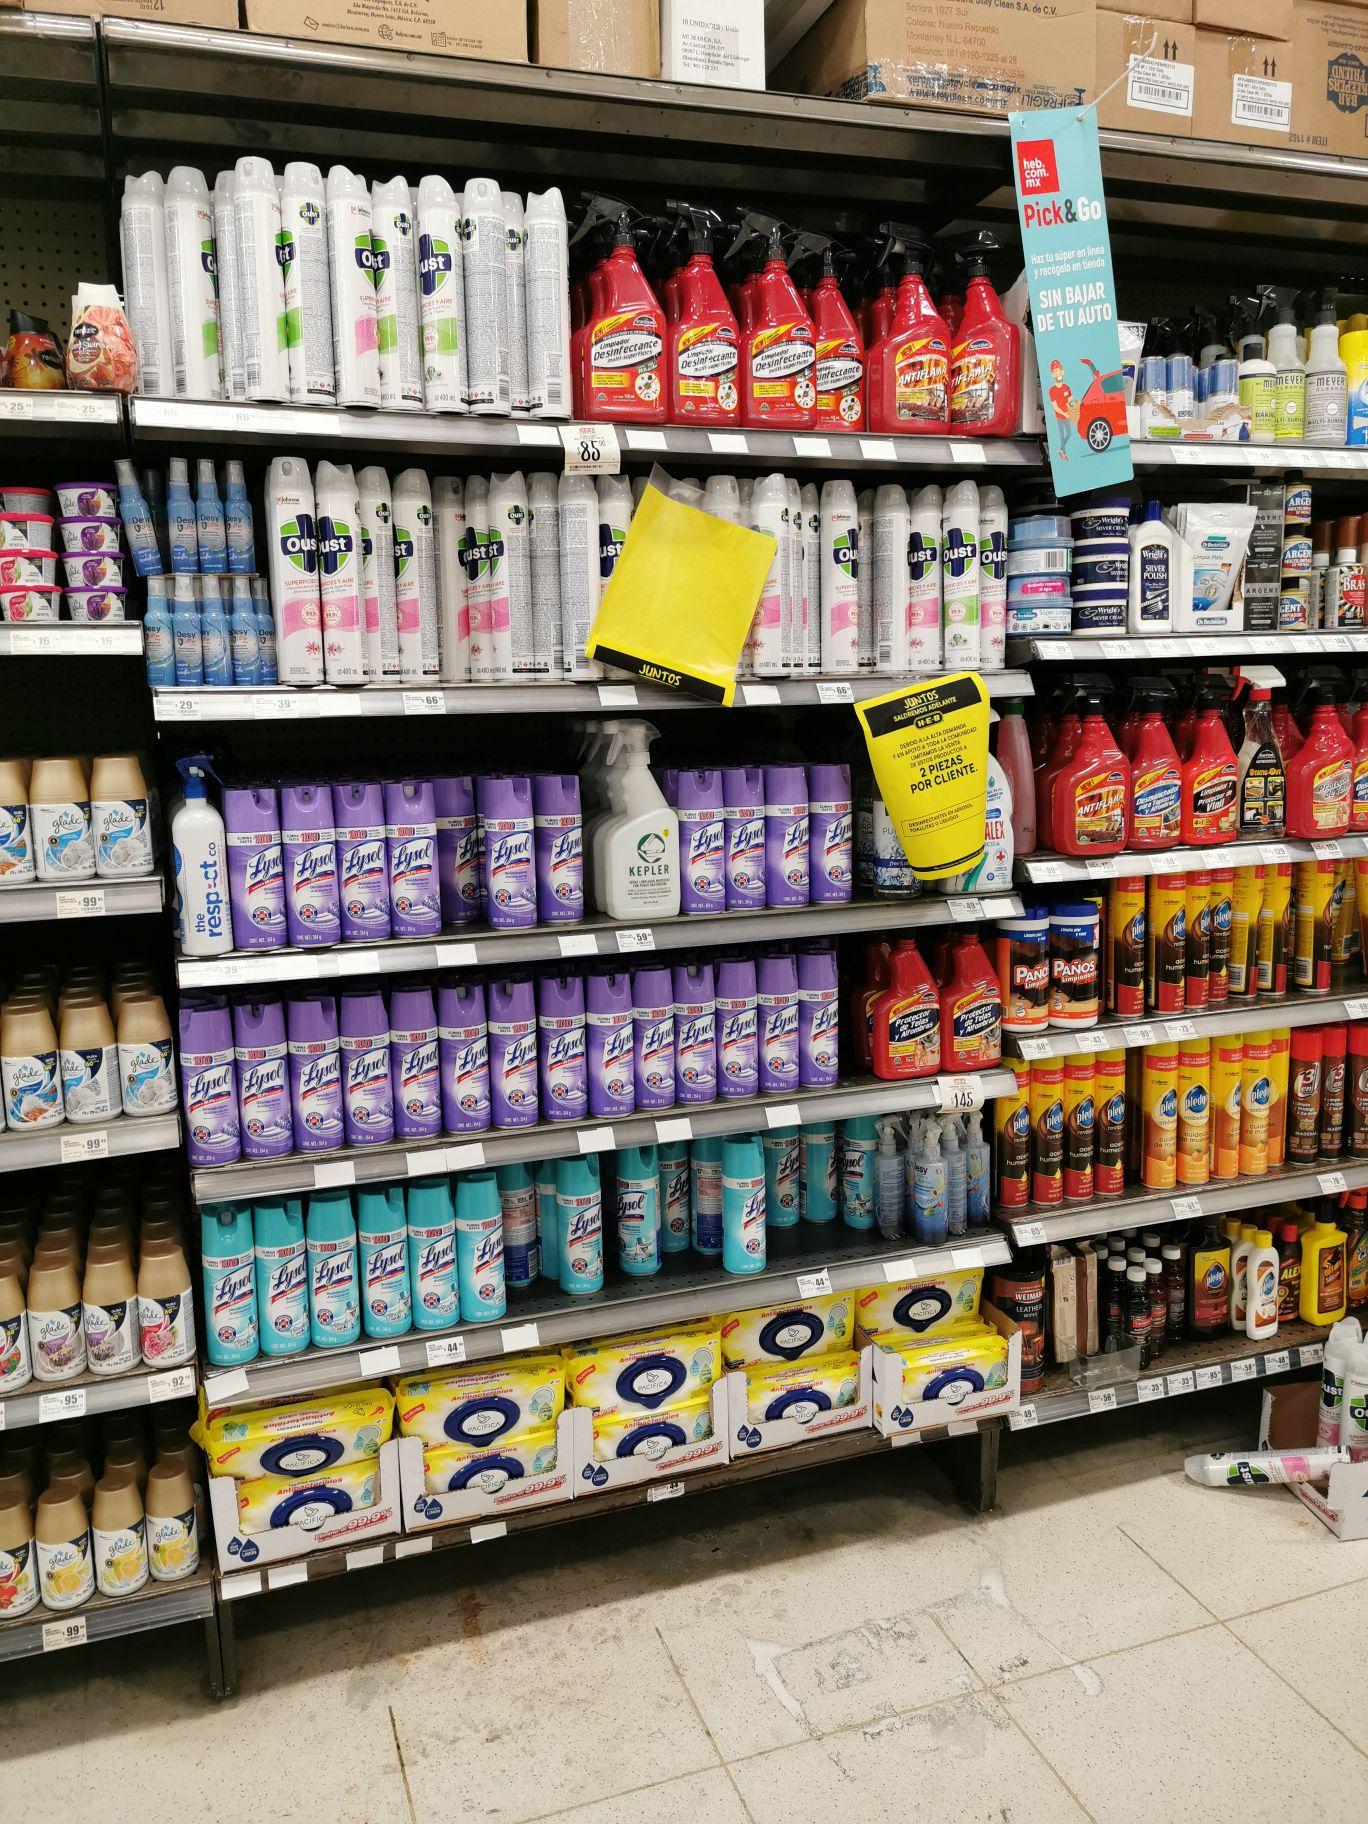 HEB: Variedad de Desinfectantes Lysol, Oust y Toallitas